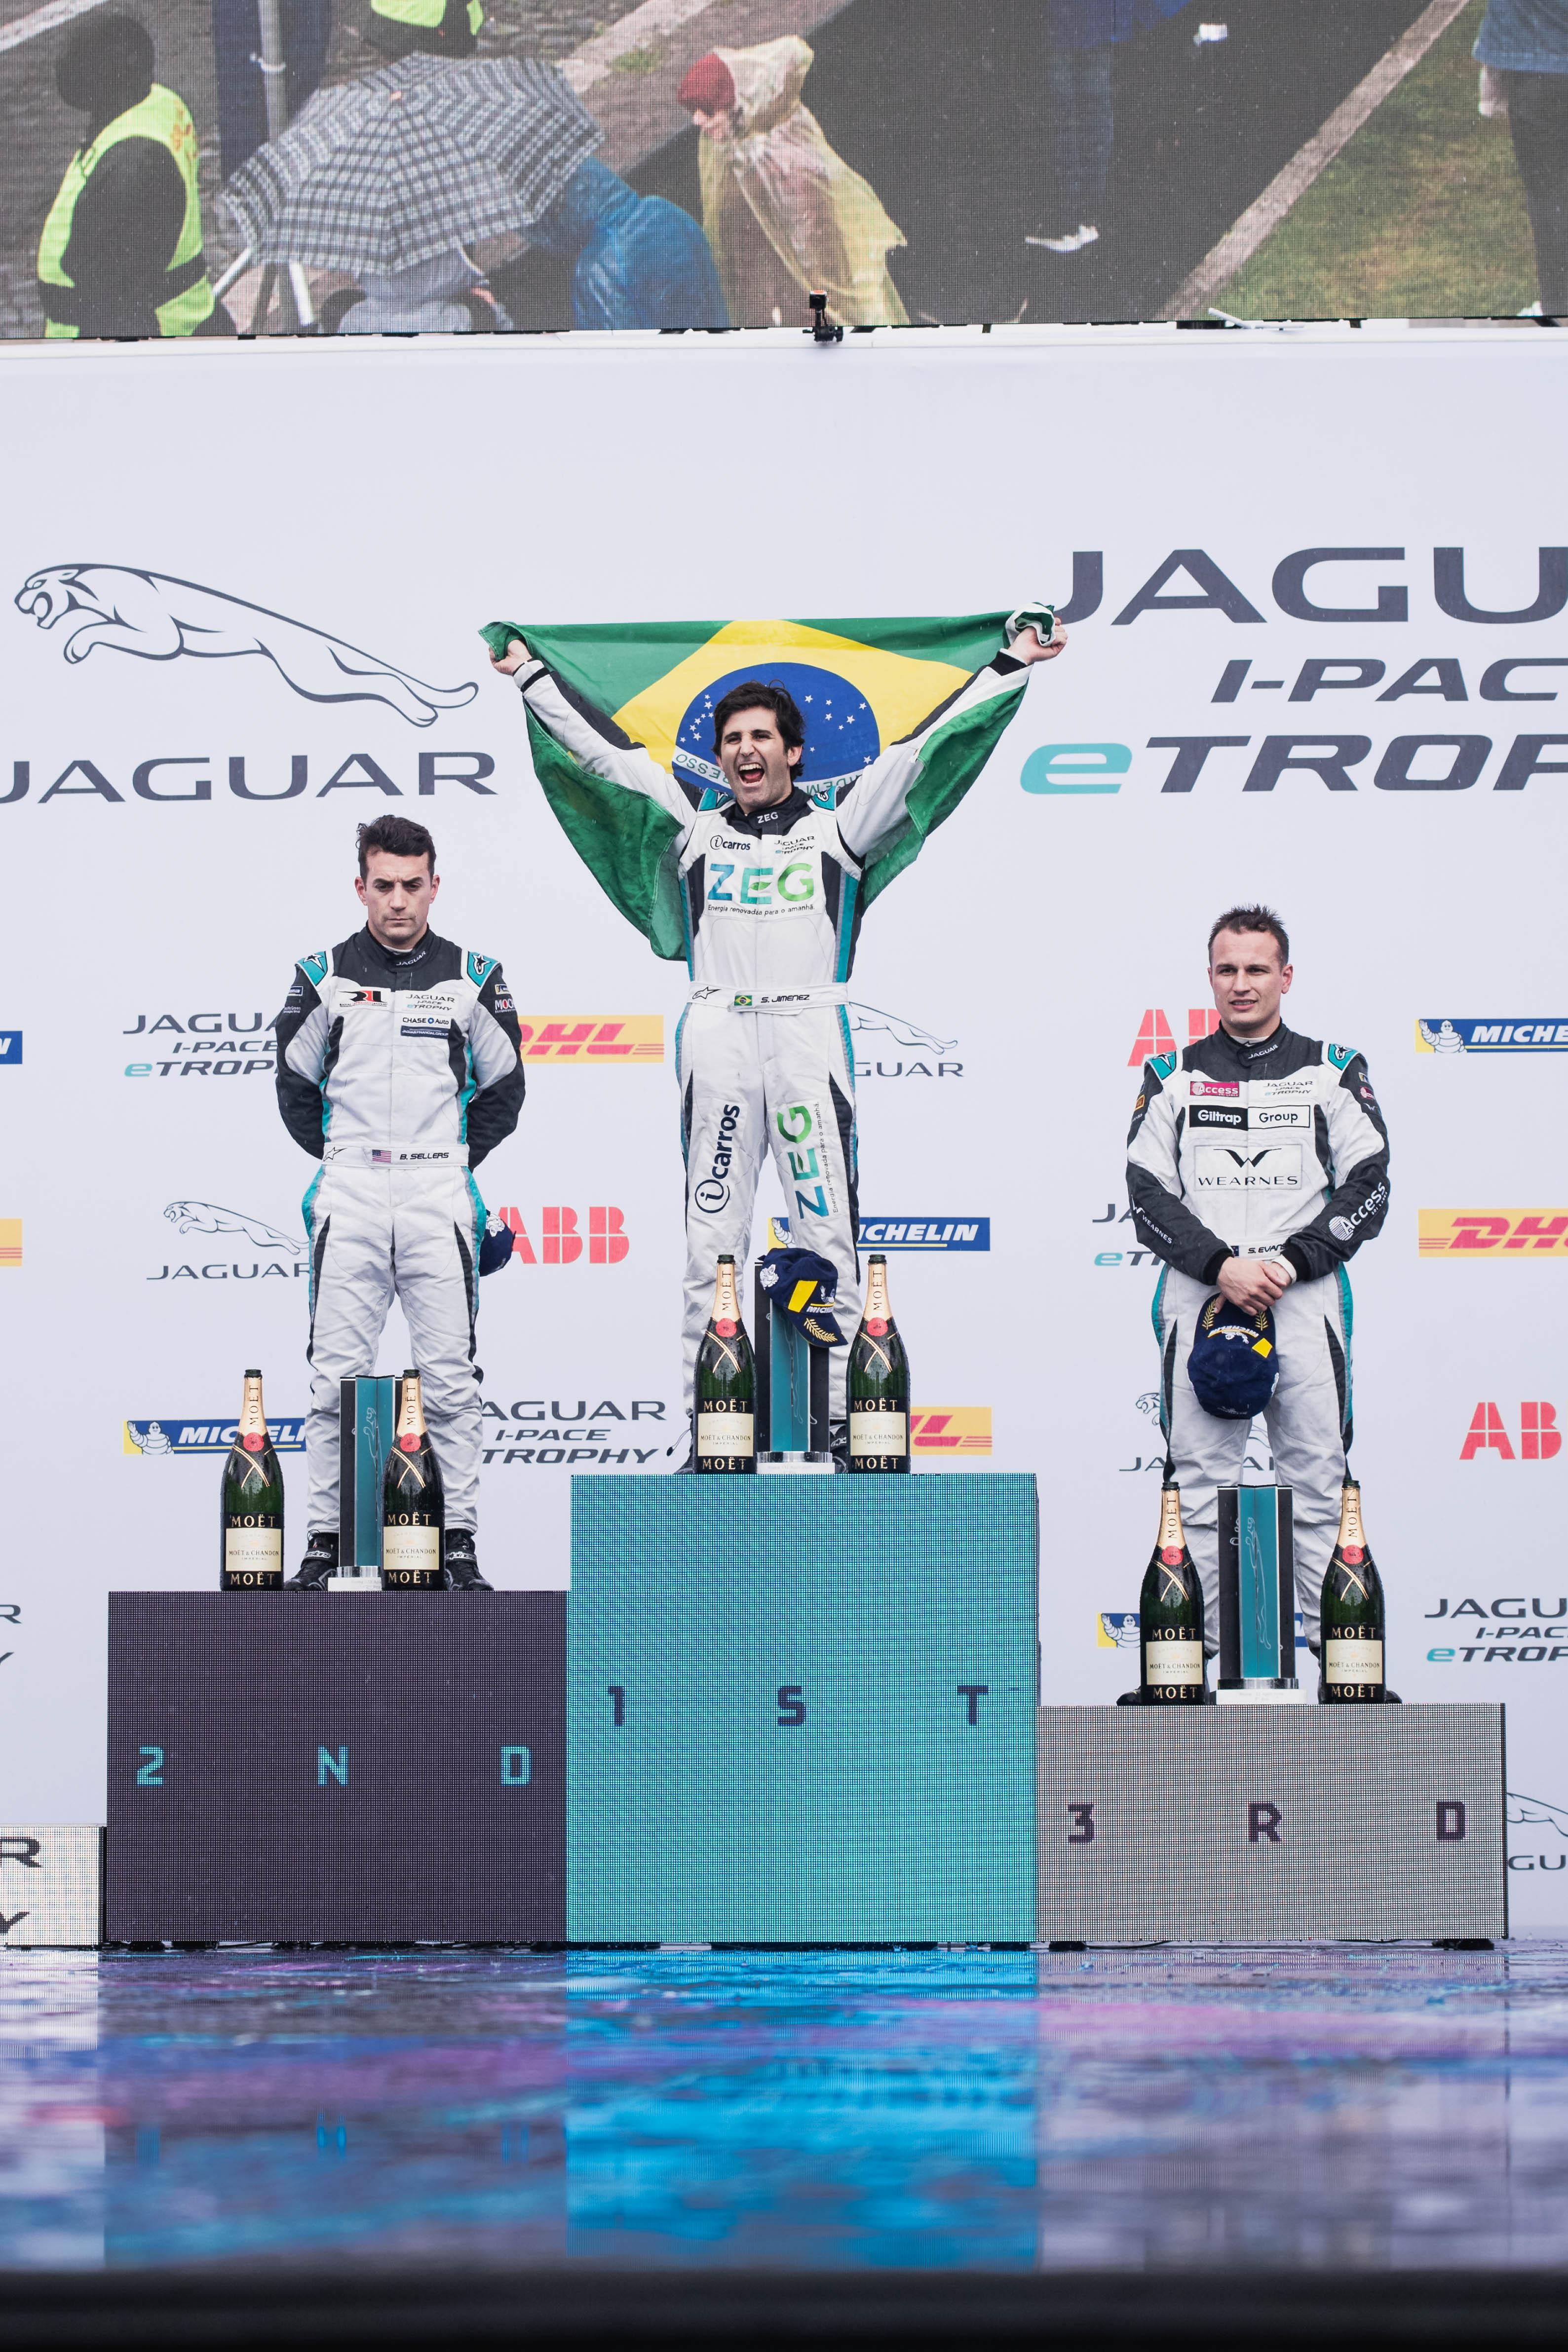 Jaguar_5.Roma_victoreleuterio_2927